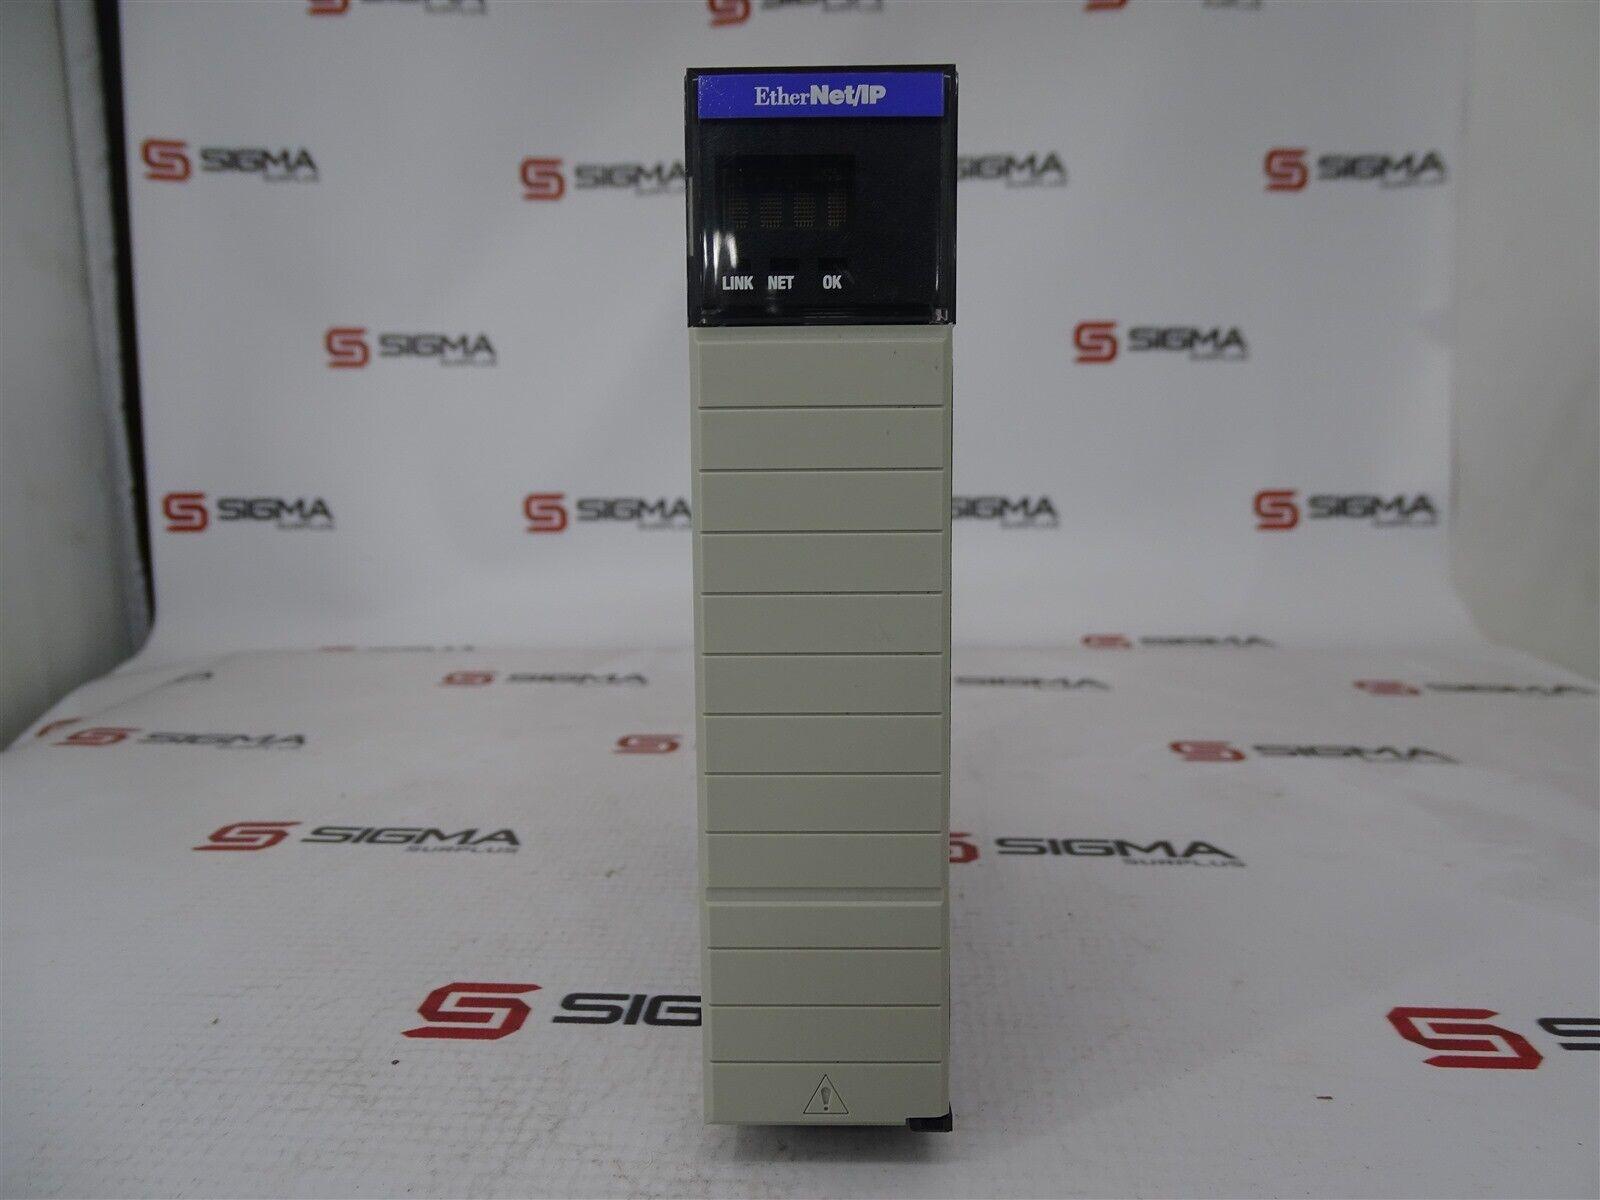 Allen-Bradley 1756-ENBT ControlLogix Ethernet/IP Module Ser. A, F/W Rev. 2.3